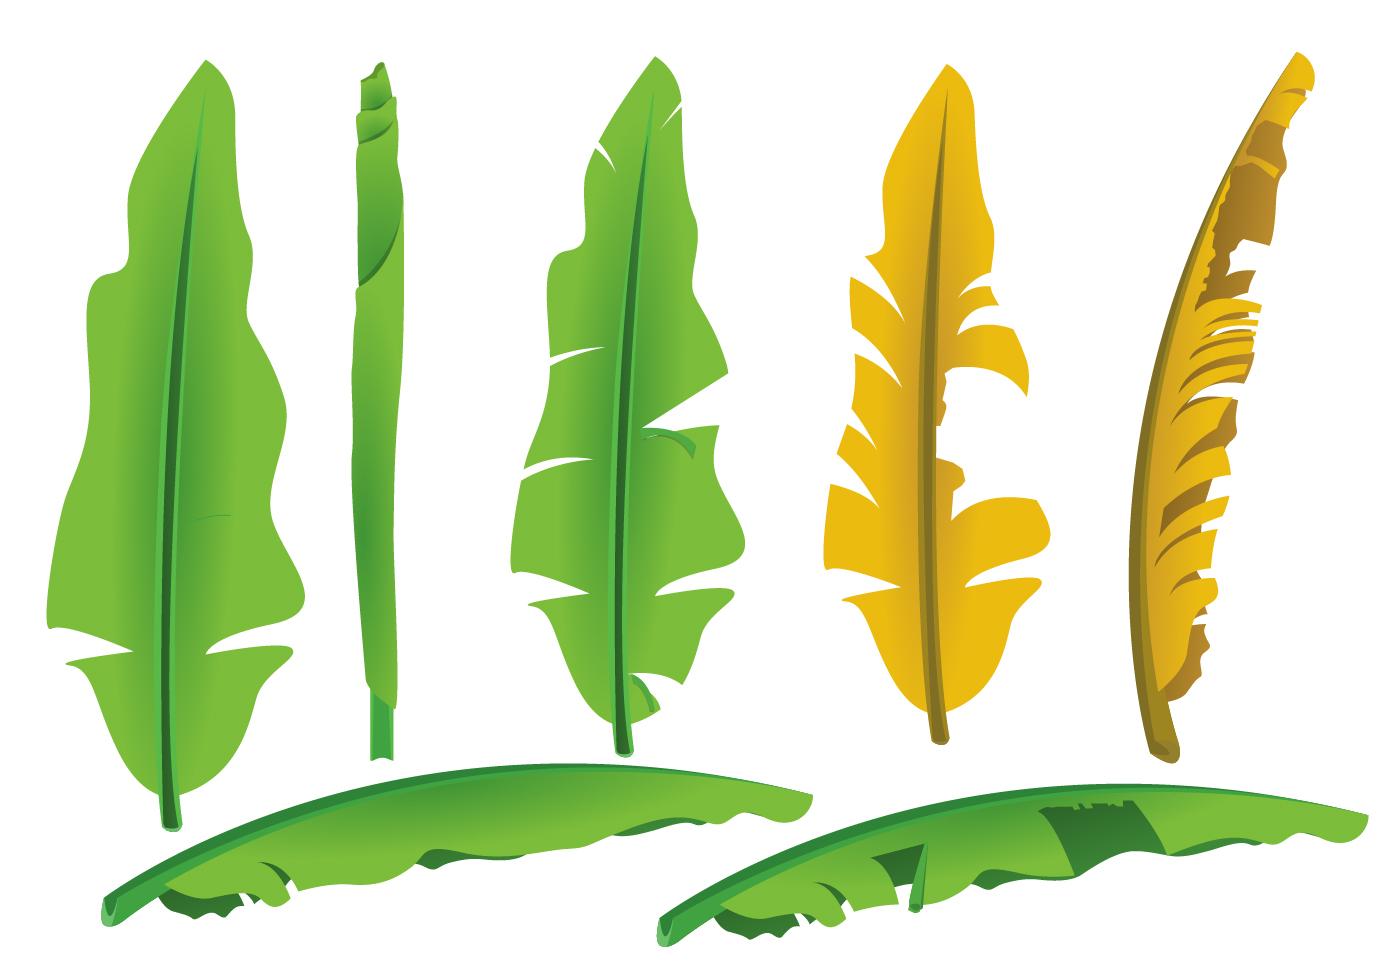 Banana Leaves Vectors - Download Free Vector Art, Stock Graphics ...